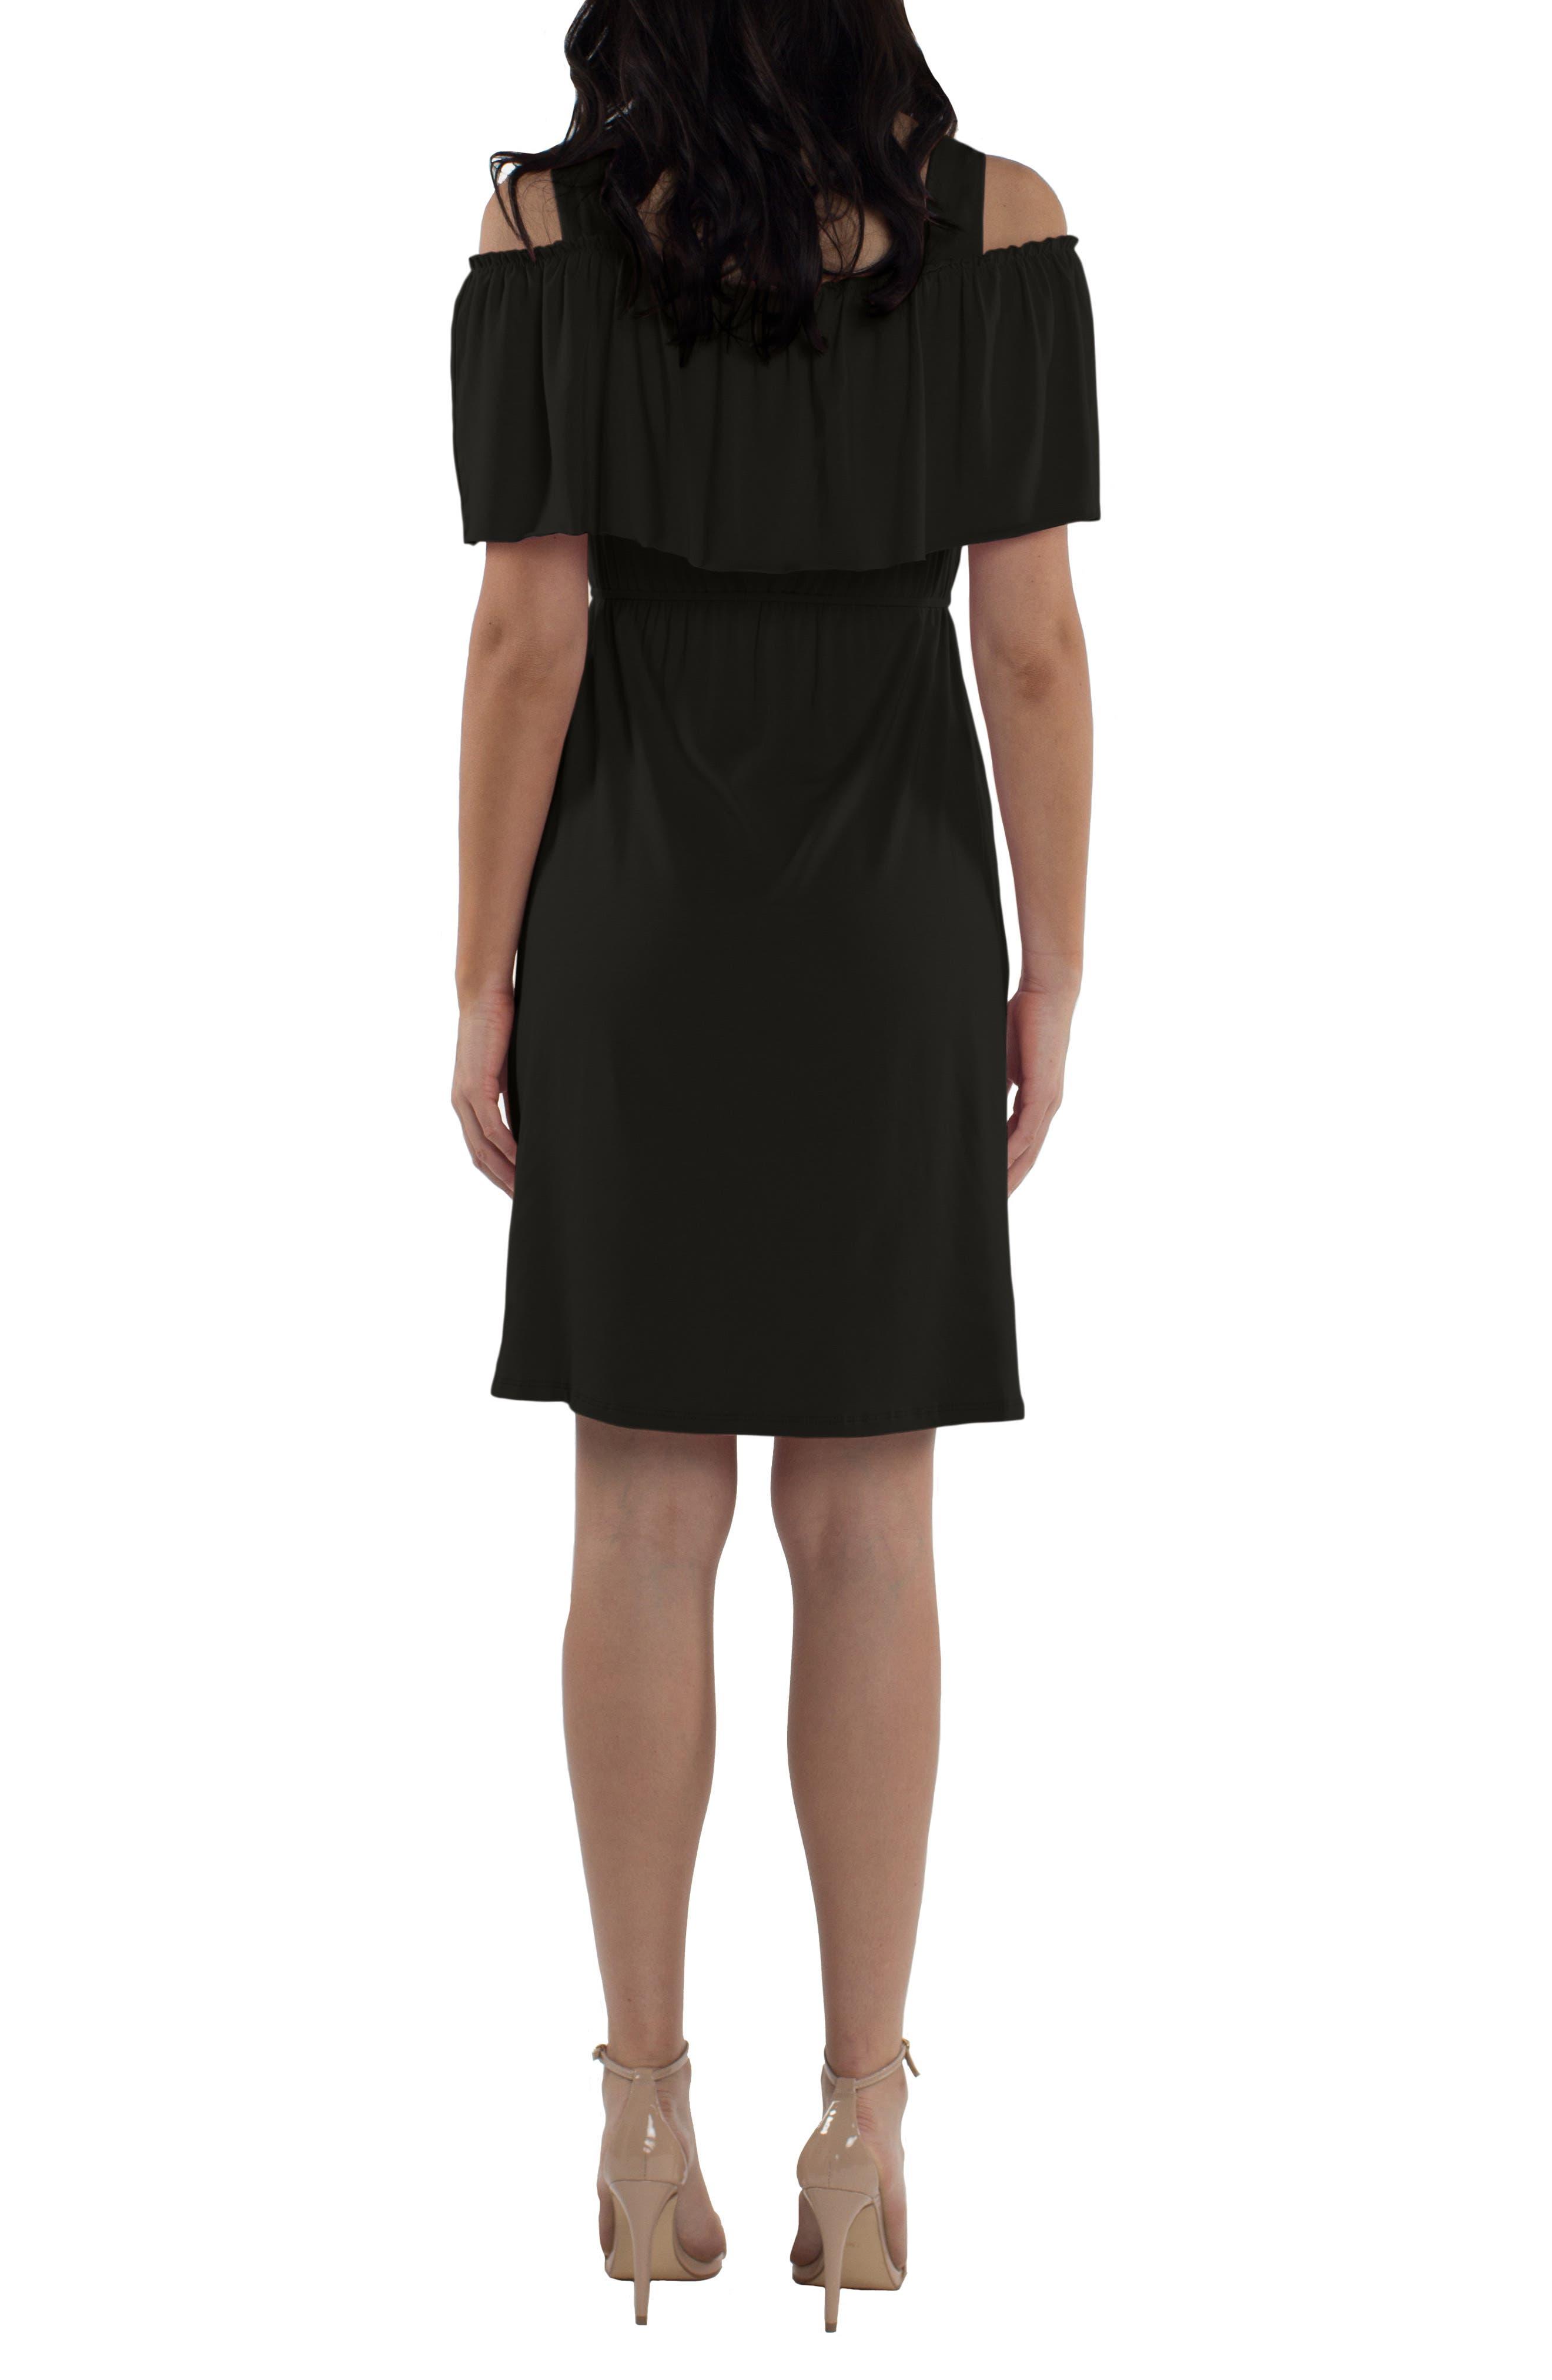 Reagan Nursing Dress,                             Alternate thumbnail 2, color,                             BLACK